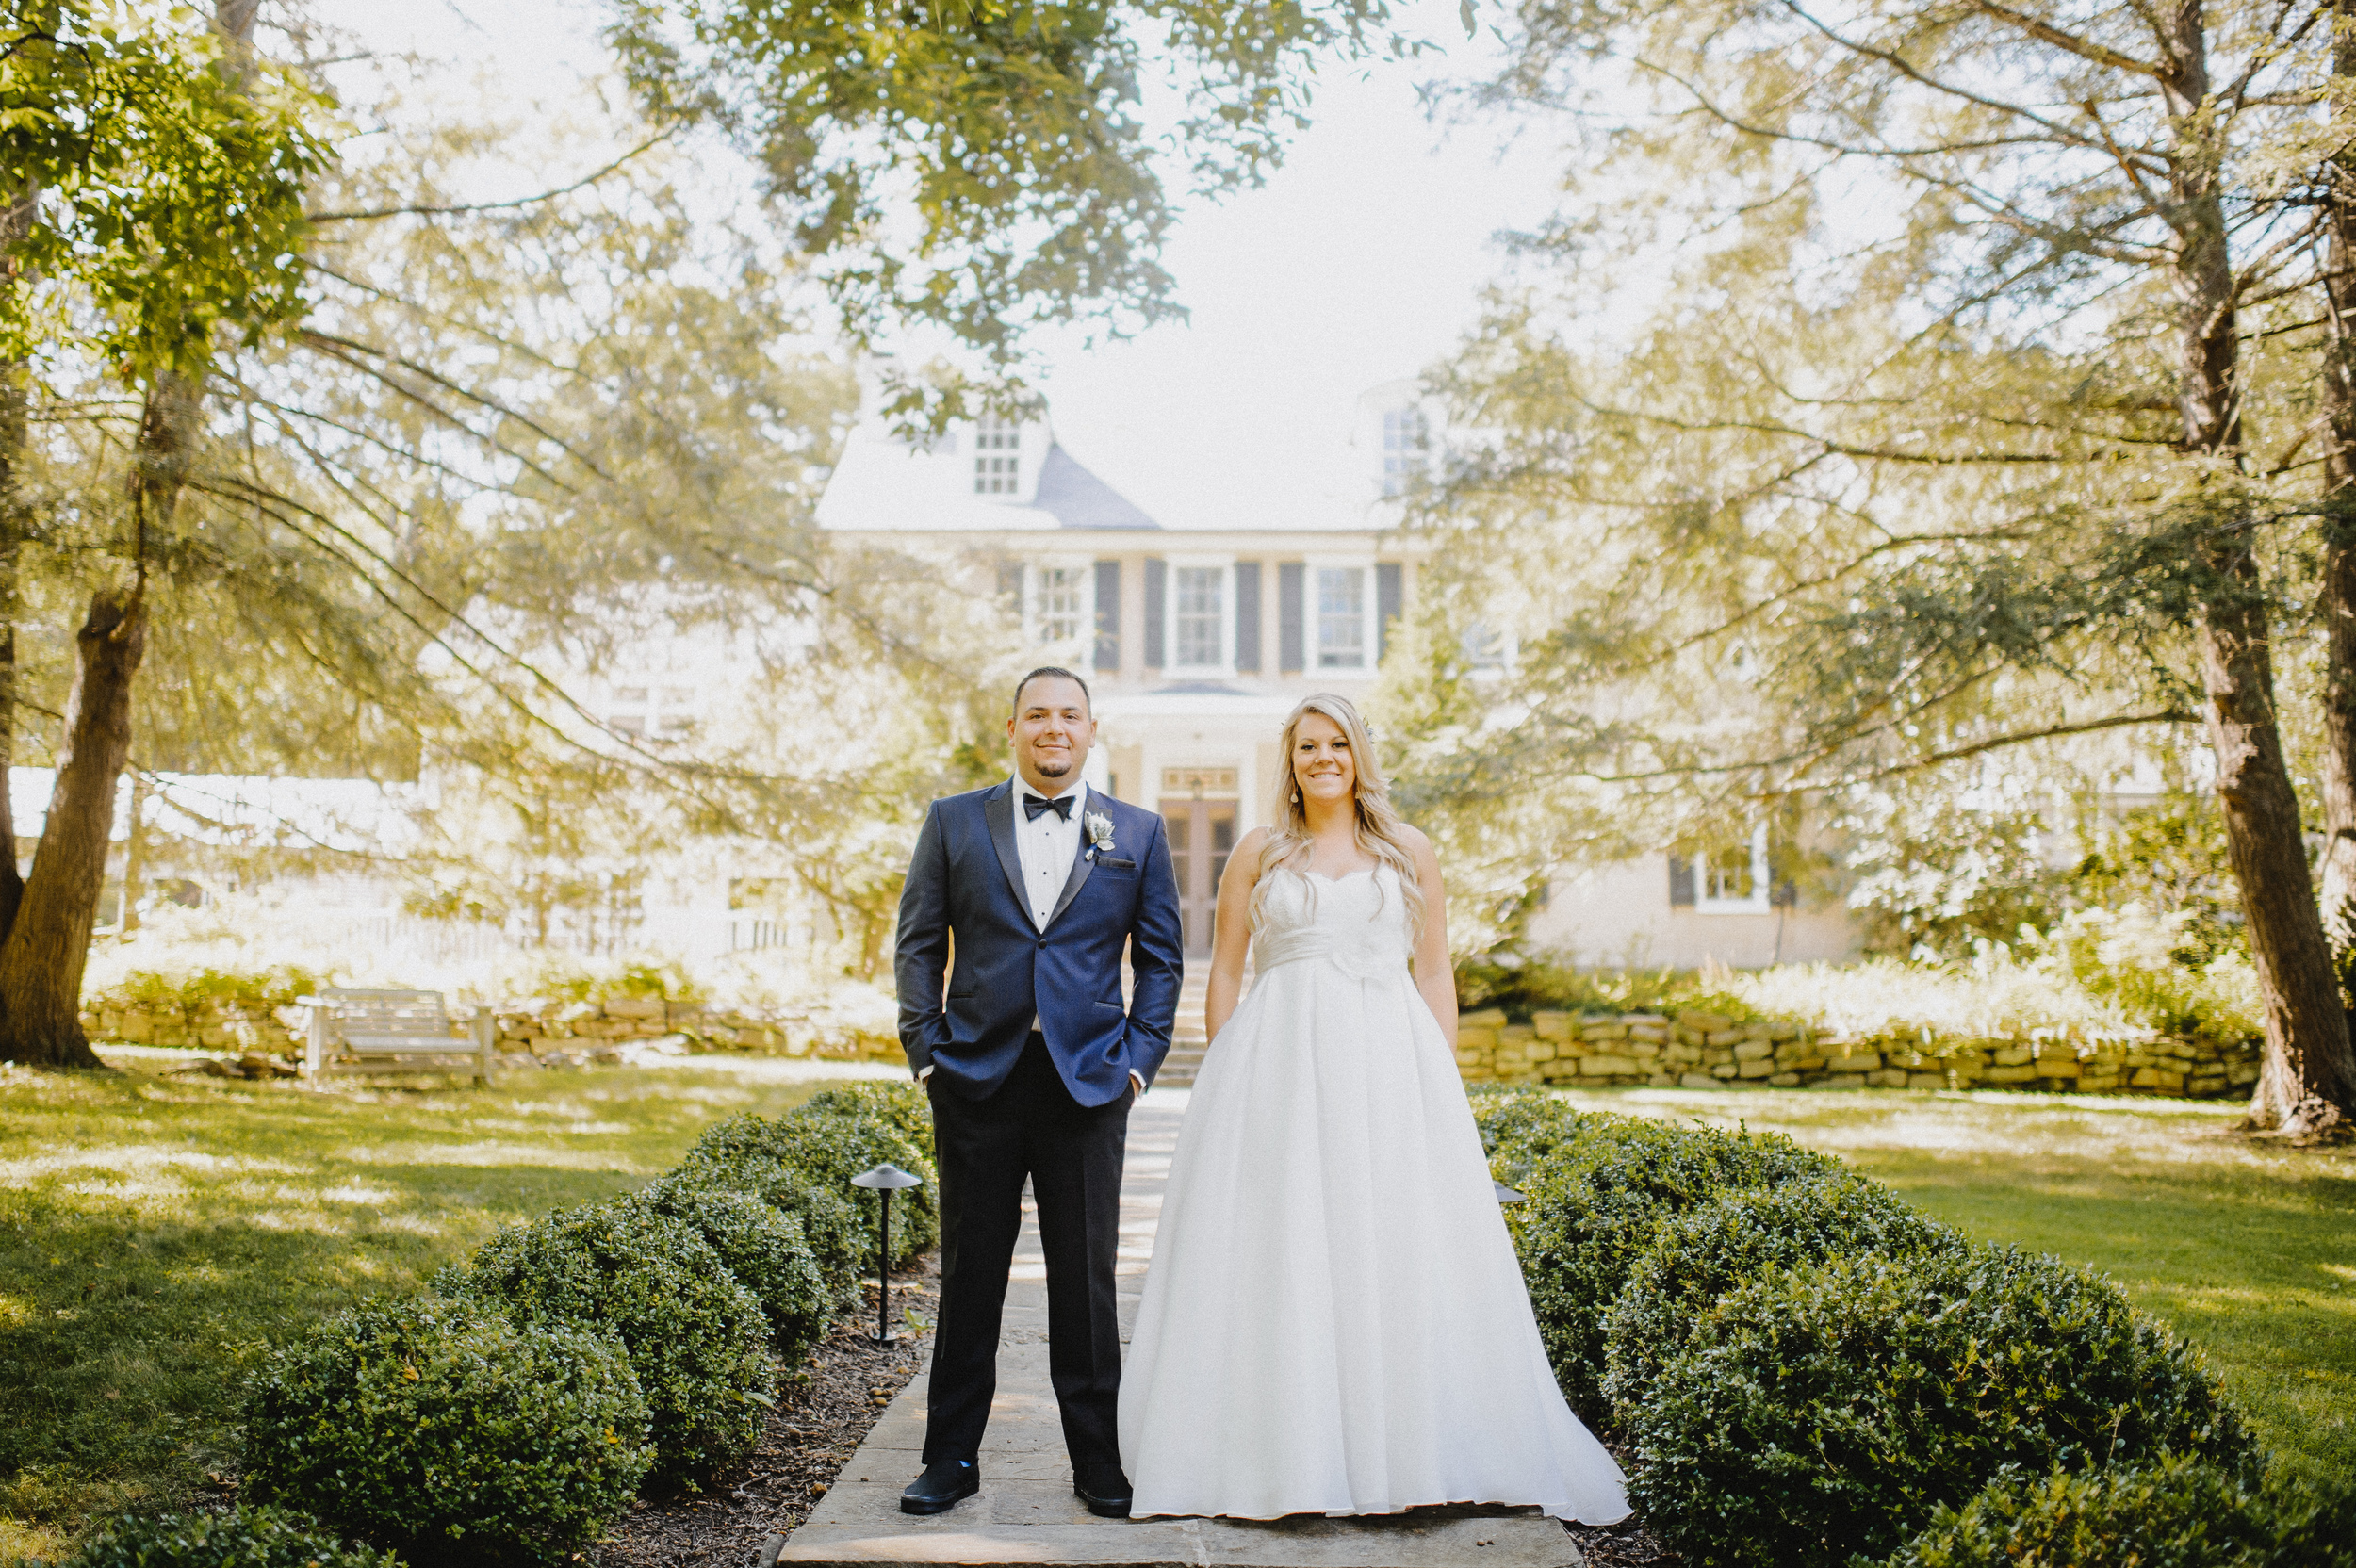 holly-hedge-estate-wedding-photographer-pat-robinson-photography-25.jpg